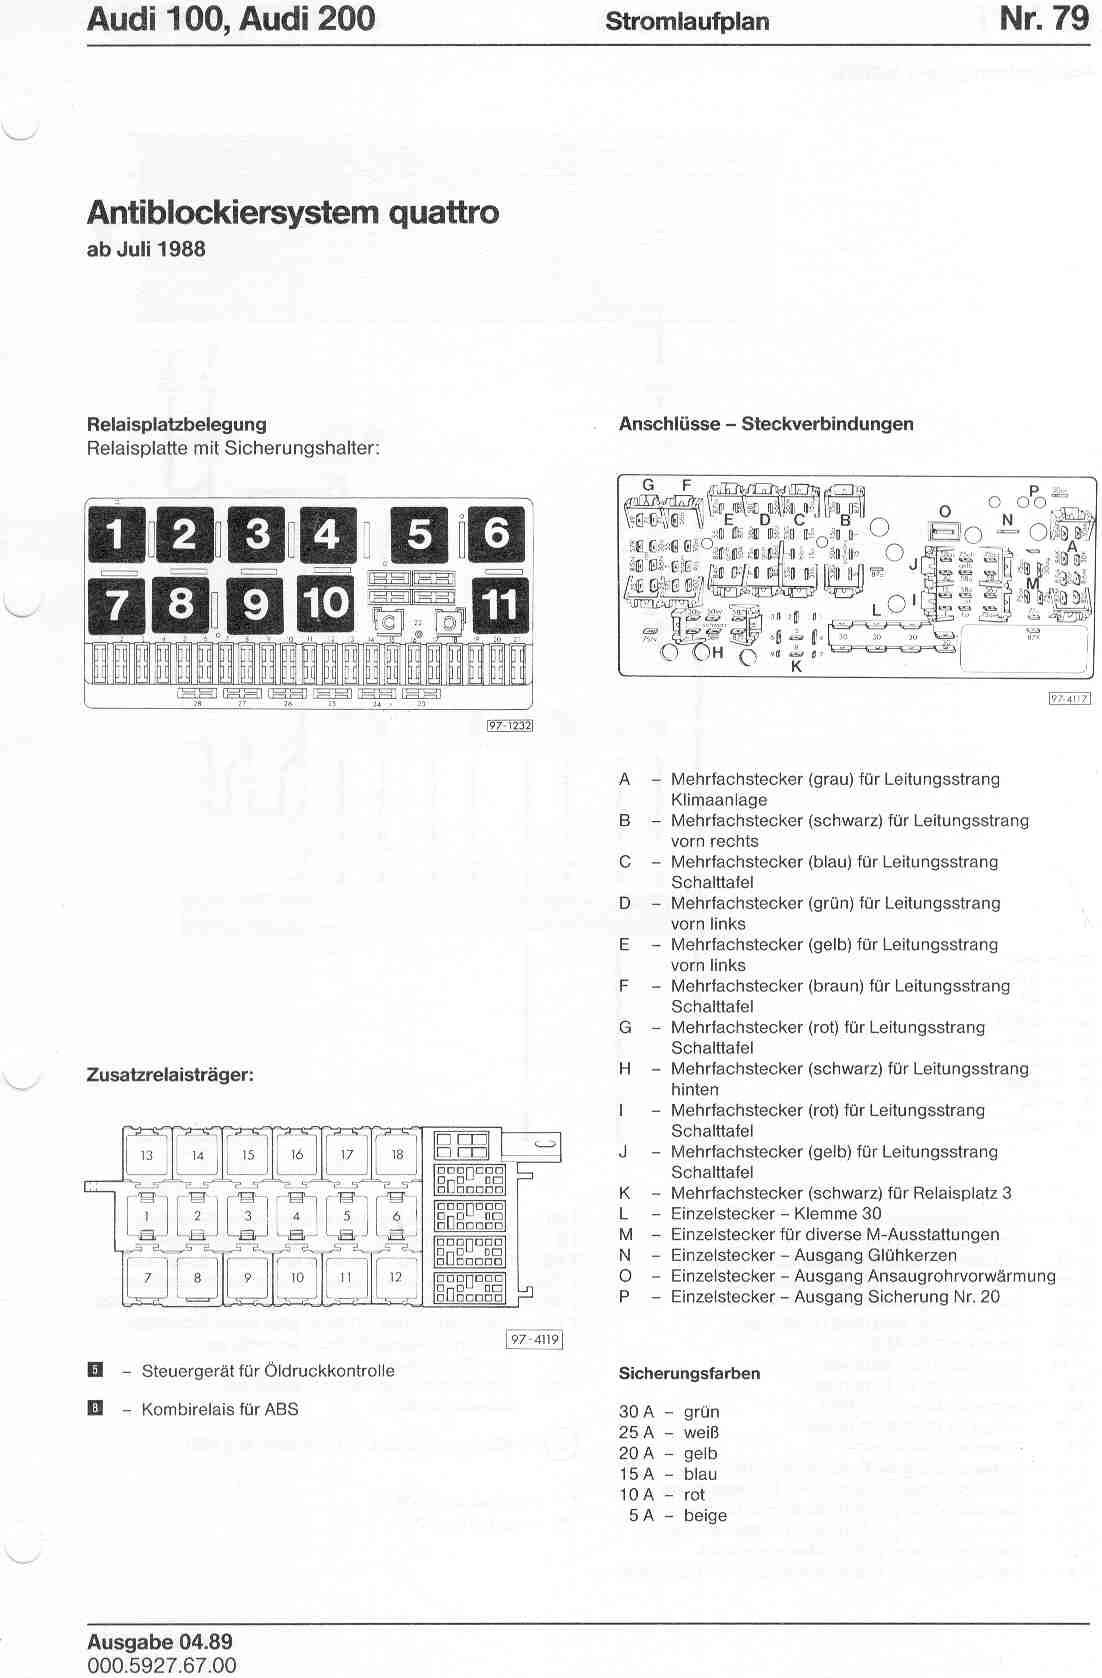 Superb Audi 80 B4 Fuse Box Basic Electronics Wiring Diagram Wiring Cloud Hemtshollocom